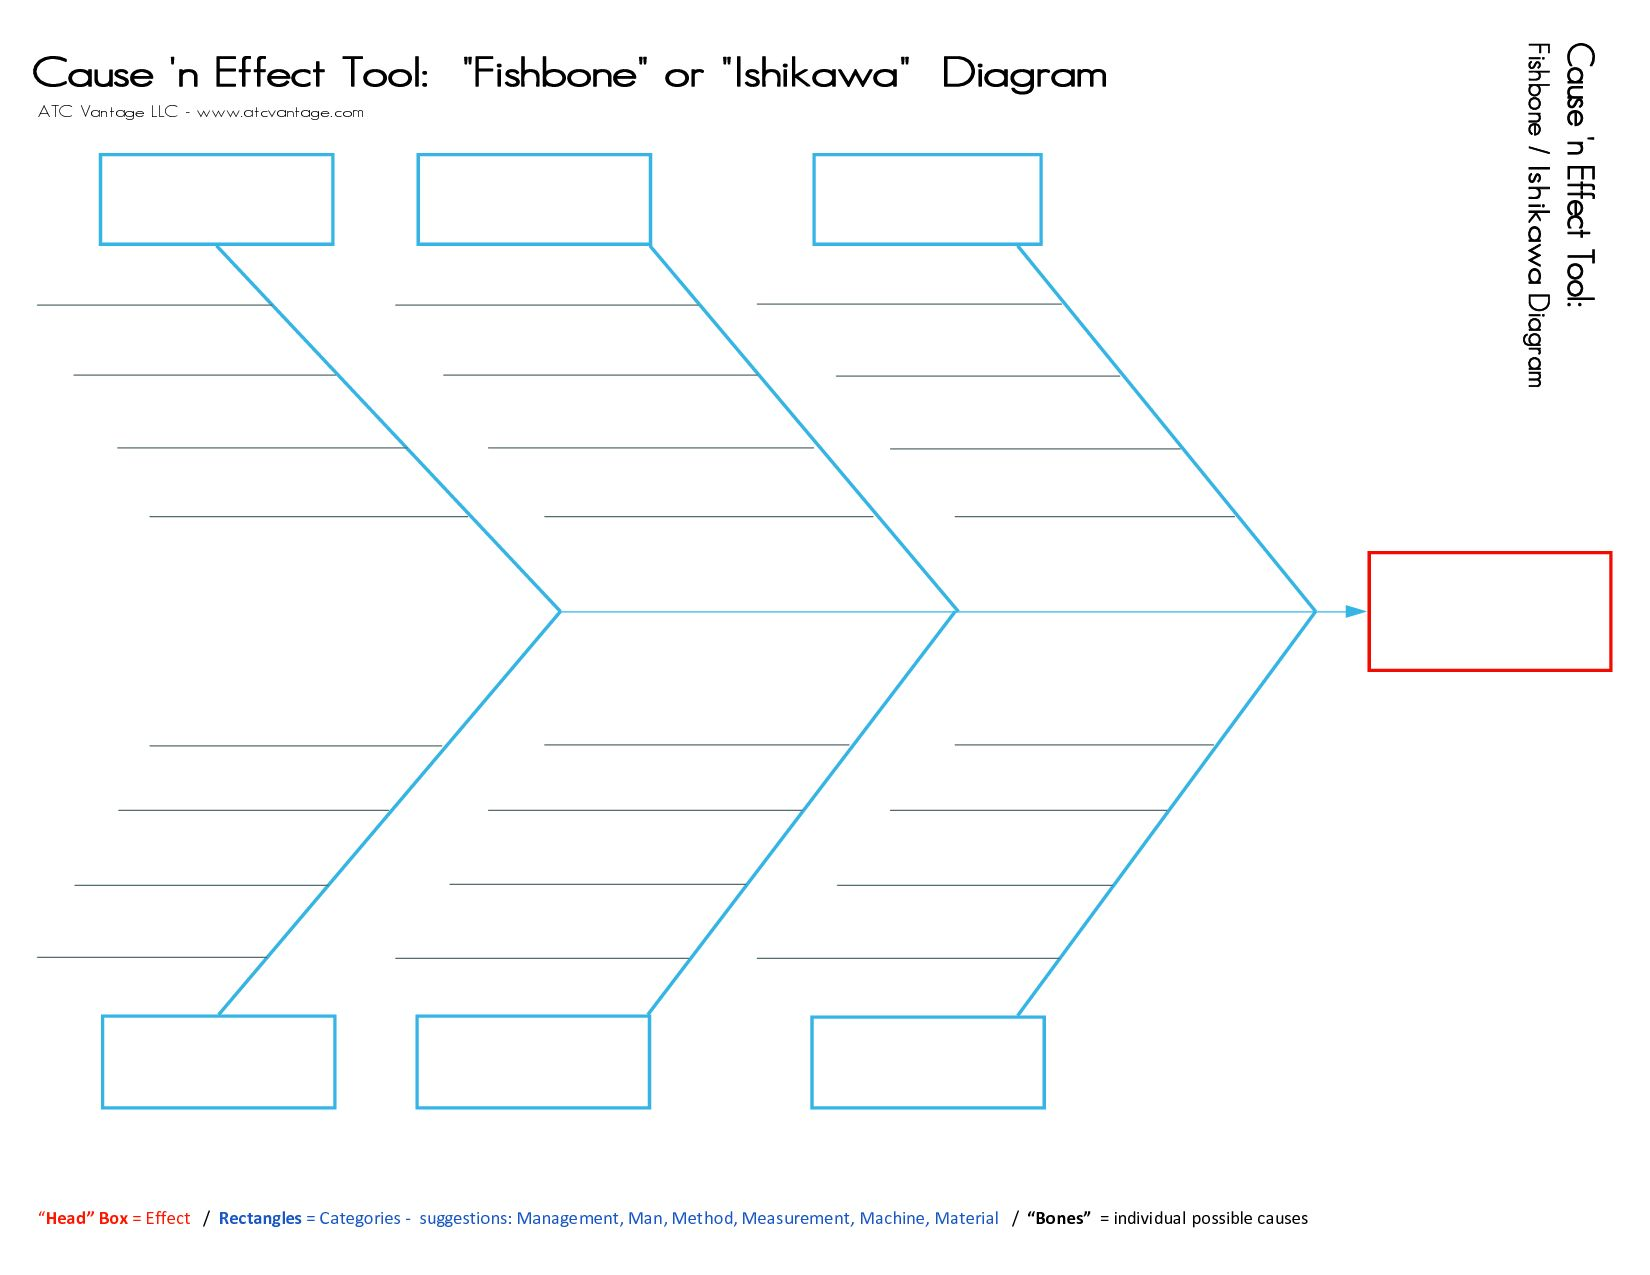 Fishbone Template 15 Authorized Fishbone Diagram Templates Intended For Blank Fishbone Diagram Template Word Be Ishikawa Diagram Business Template Fish Bone